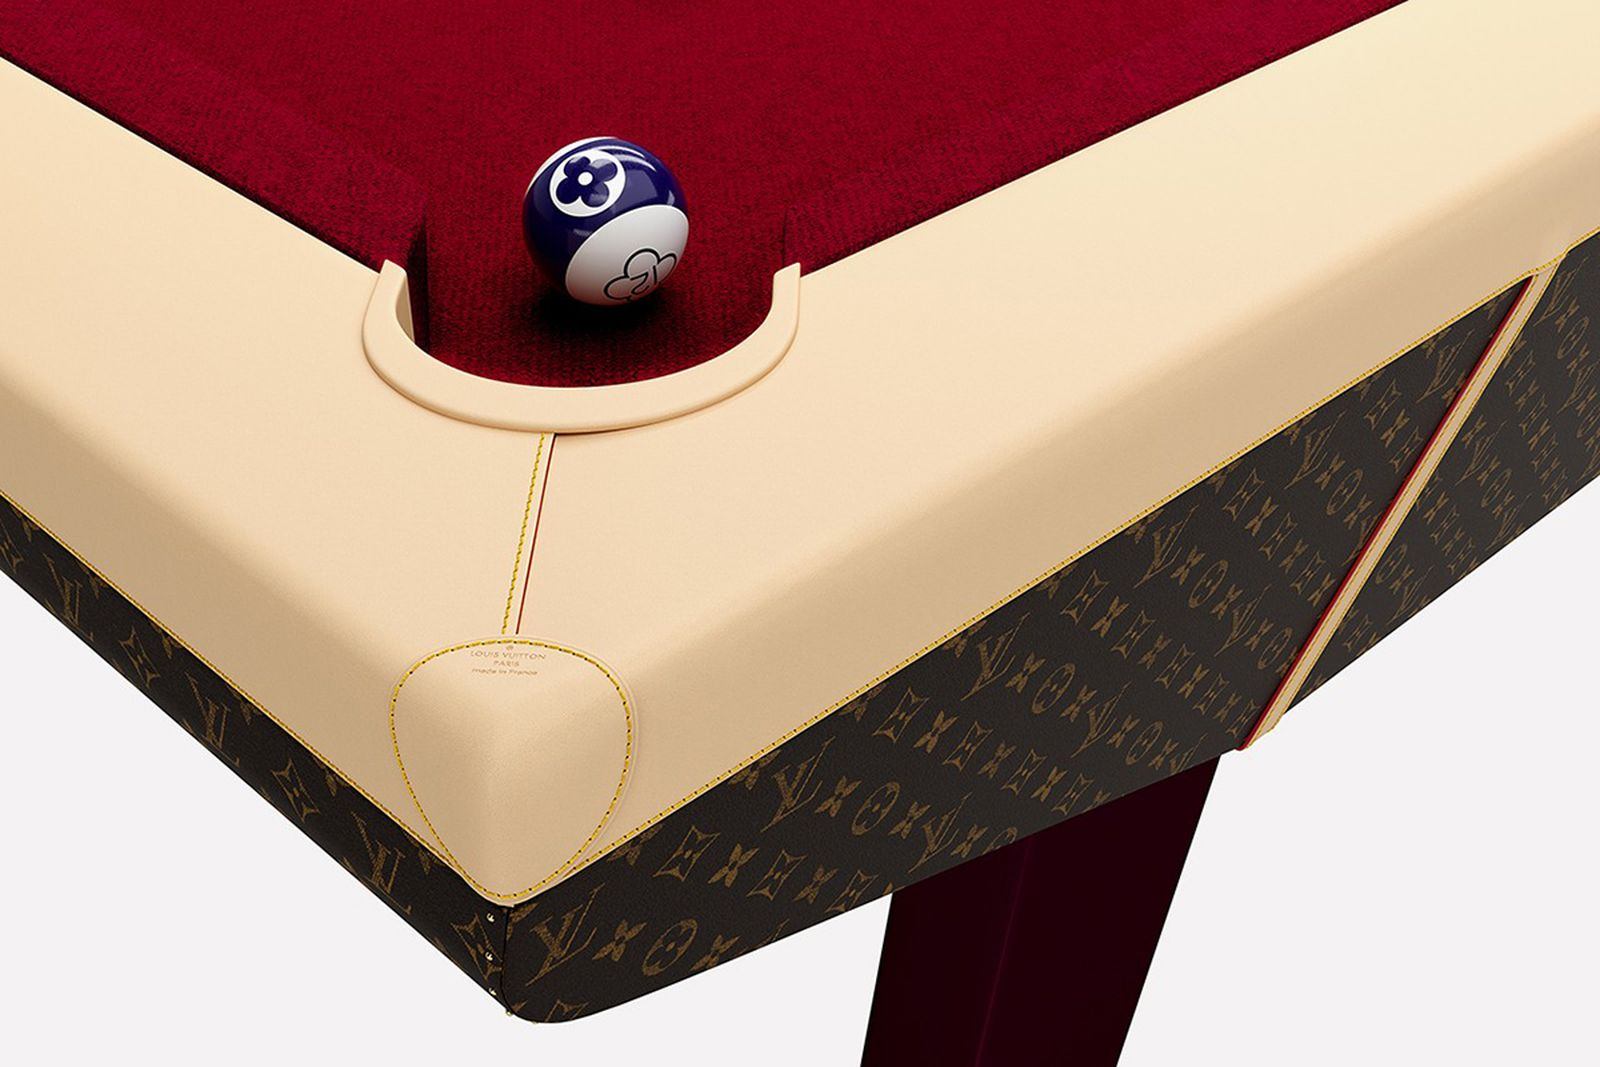 Louis Vuitton pool table